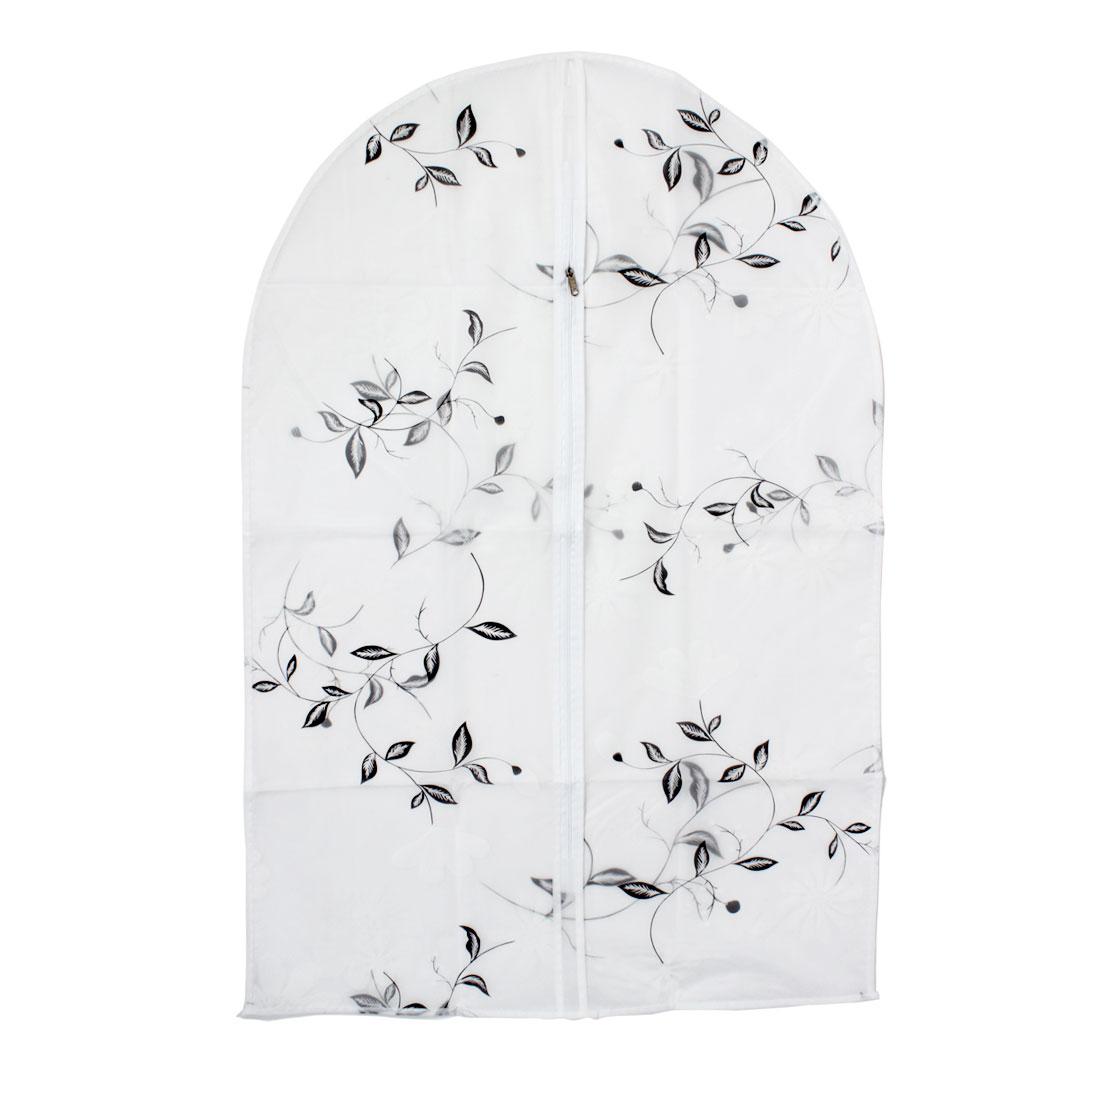 "Clothes Suit Garment PEVA Leaves Printed Dustproof Cover Bag 35"" Length"